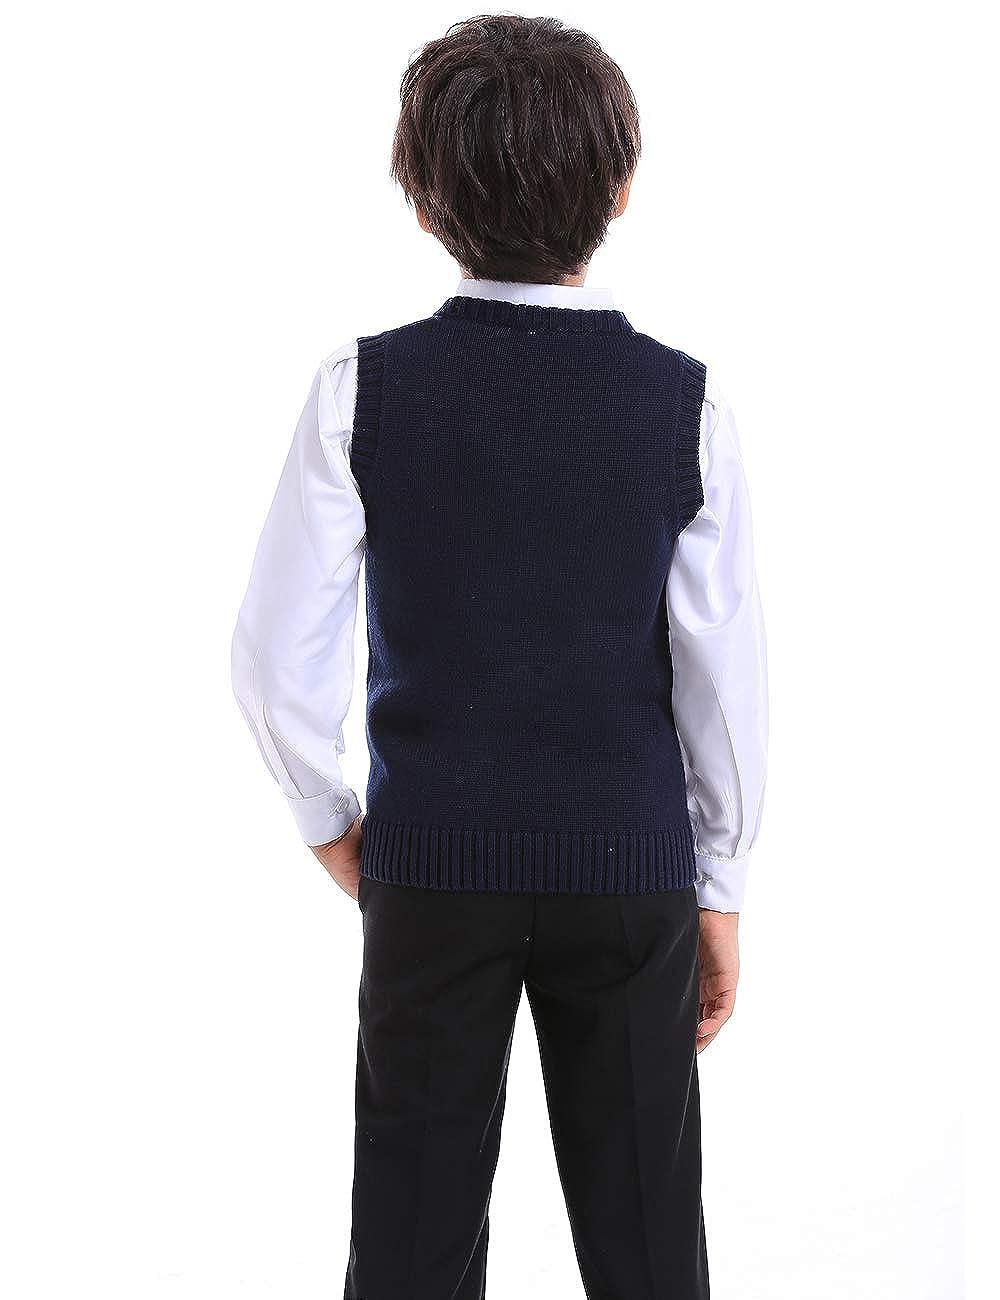 TOPTIE Boys V-Neck Cotton Knit Sleeveless Pullover School Uniform Sweater Vest SWEH-DK68304 Navy//Black